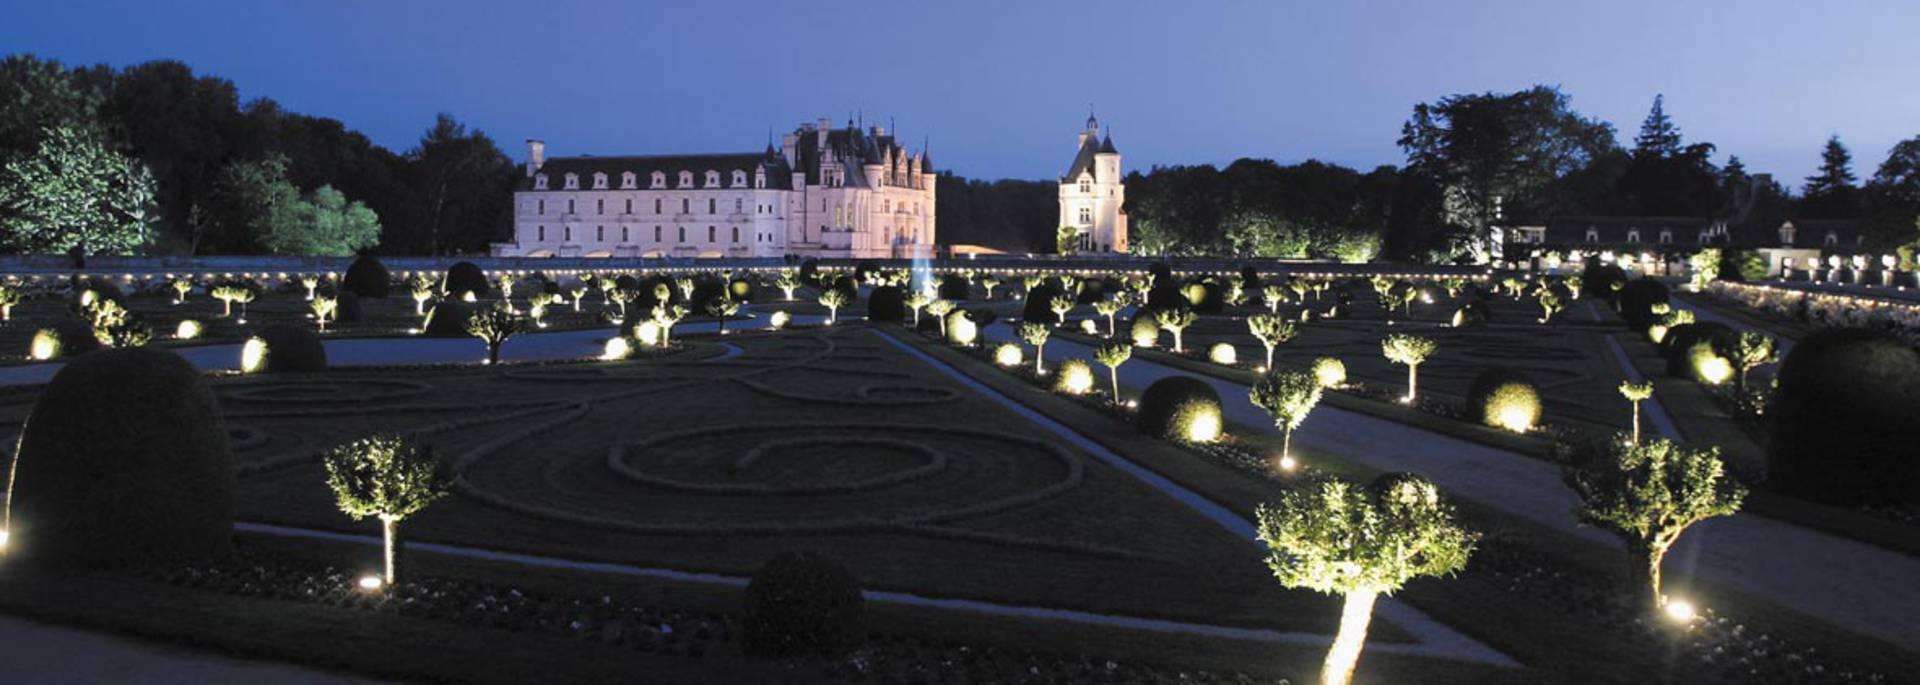 Vista notturna del castello di Chenonceau © Images de Marc